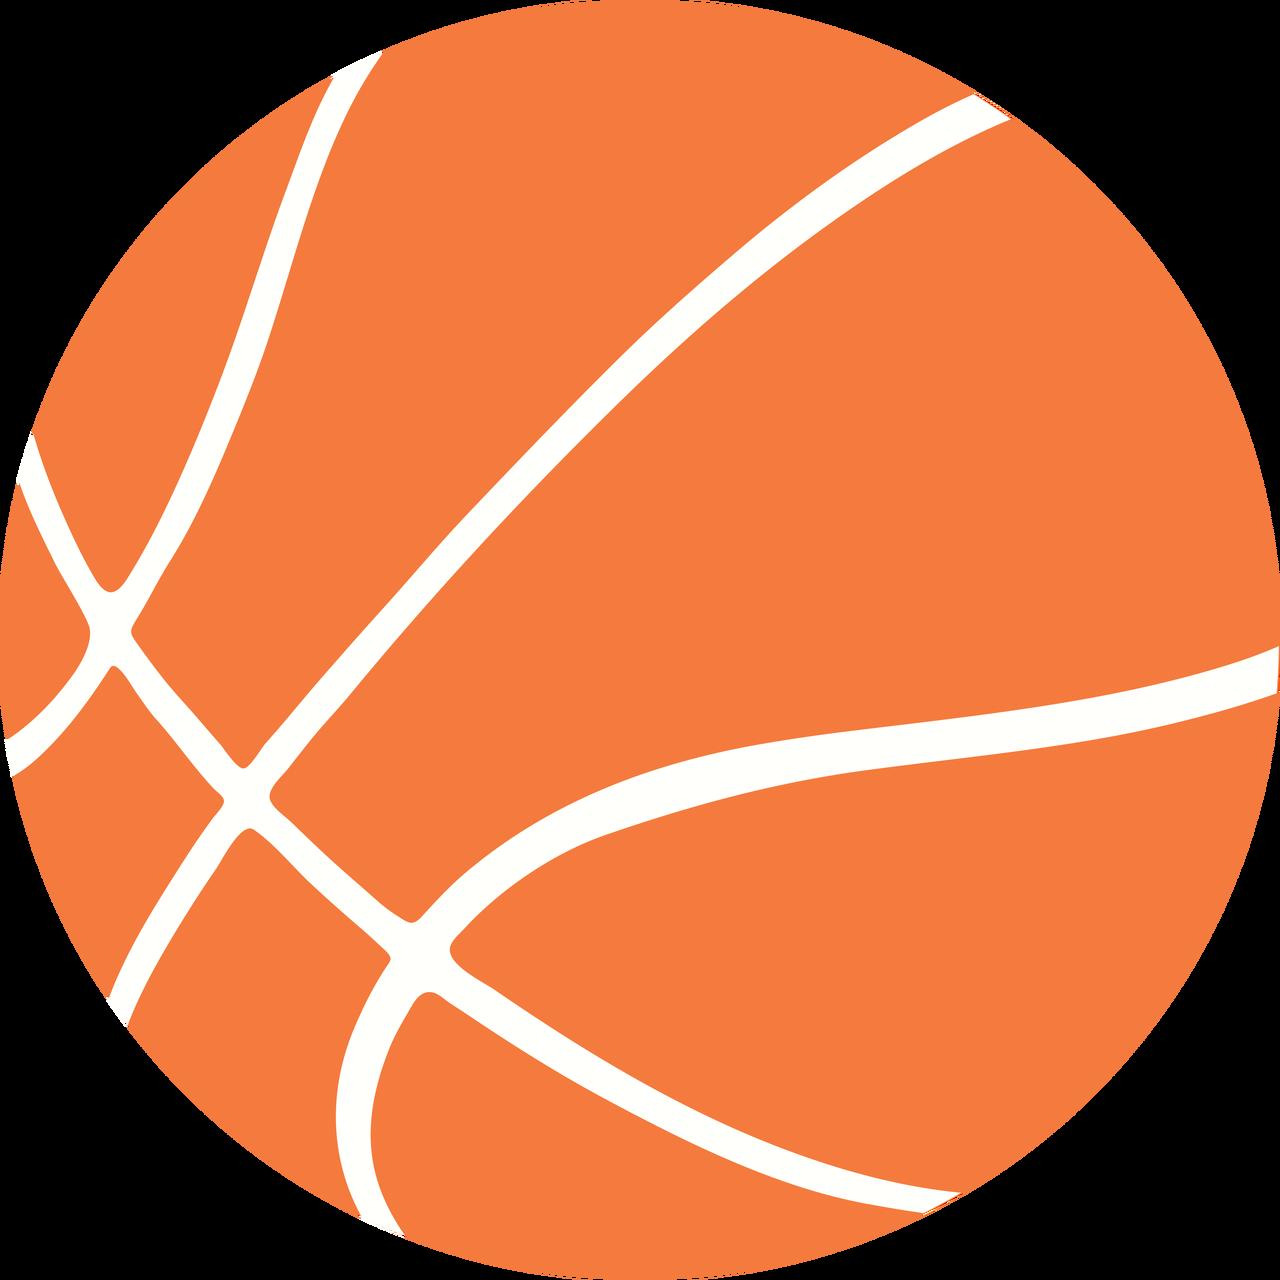 Basketball SVG Cut File